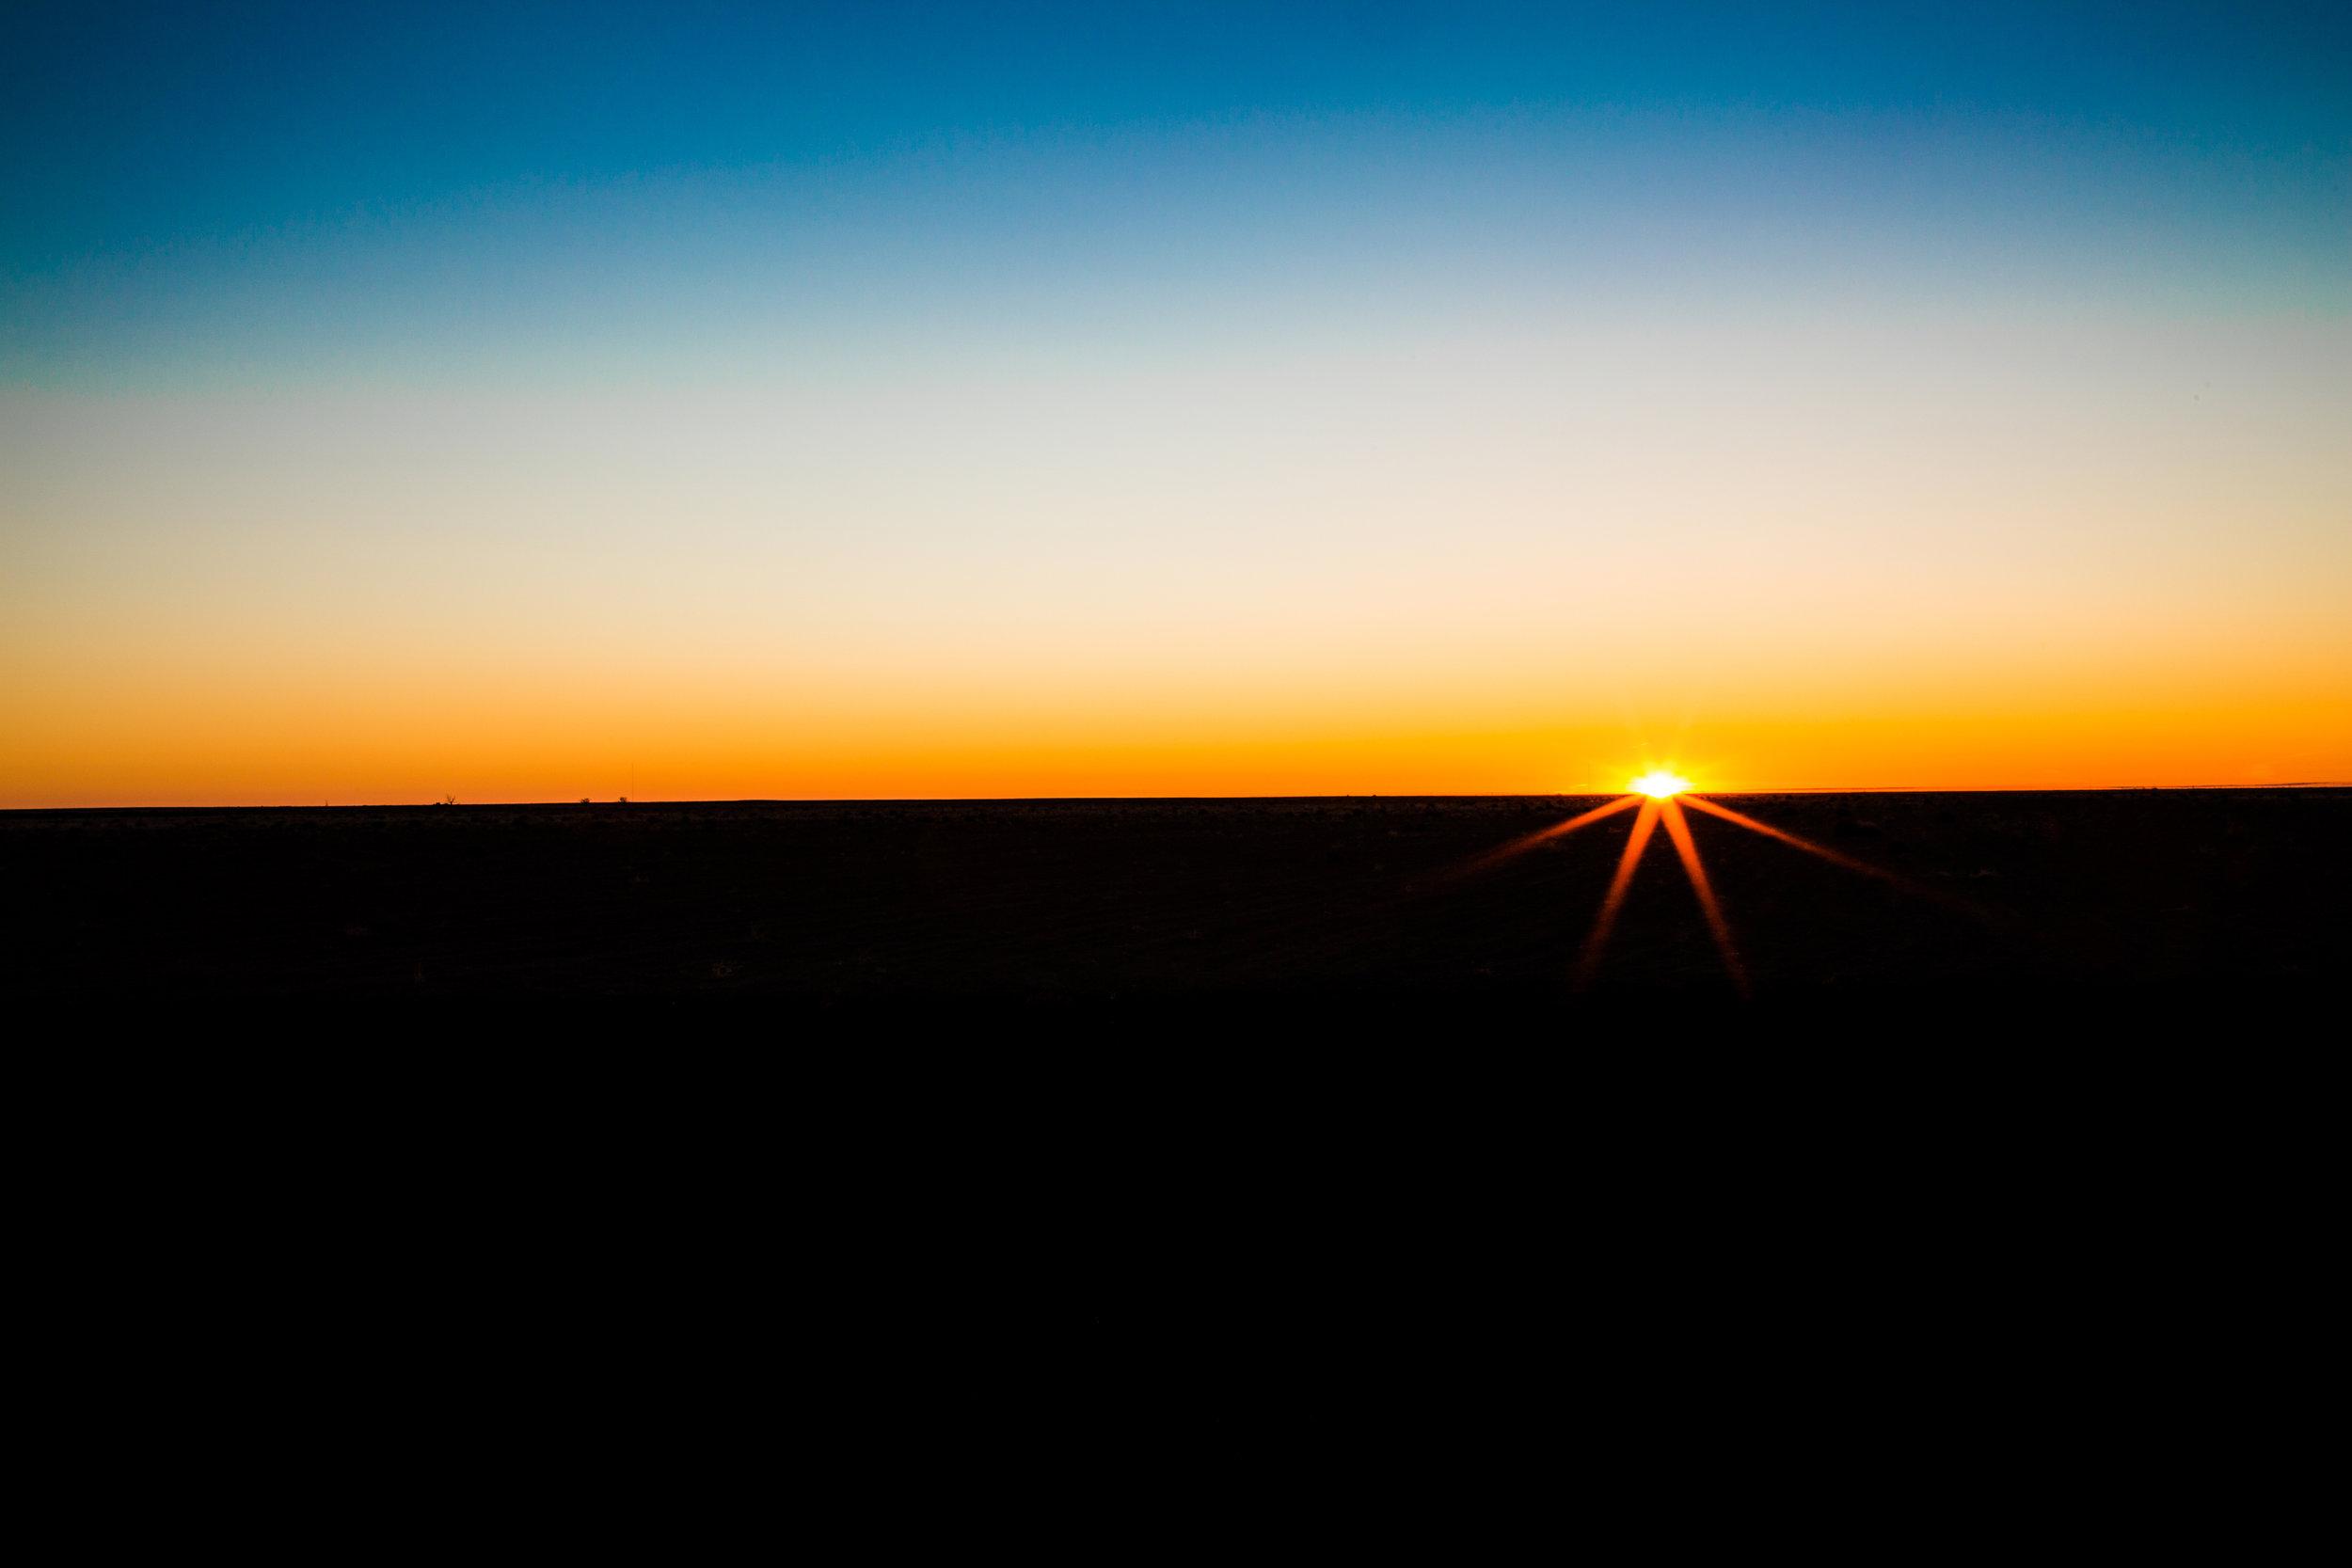 Sunrise in Two Buttes, Colorado